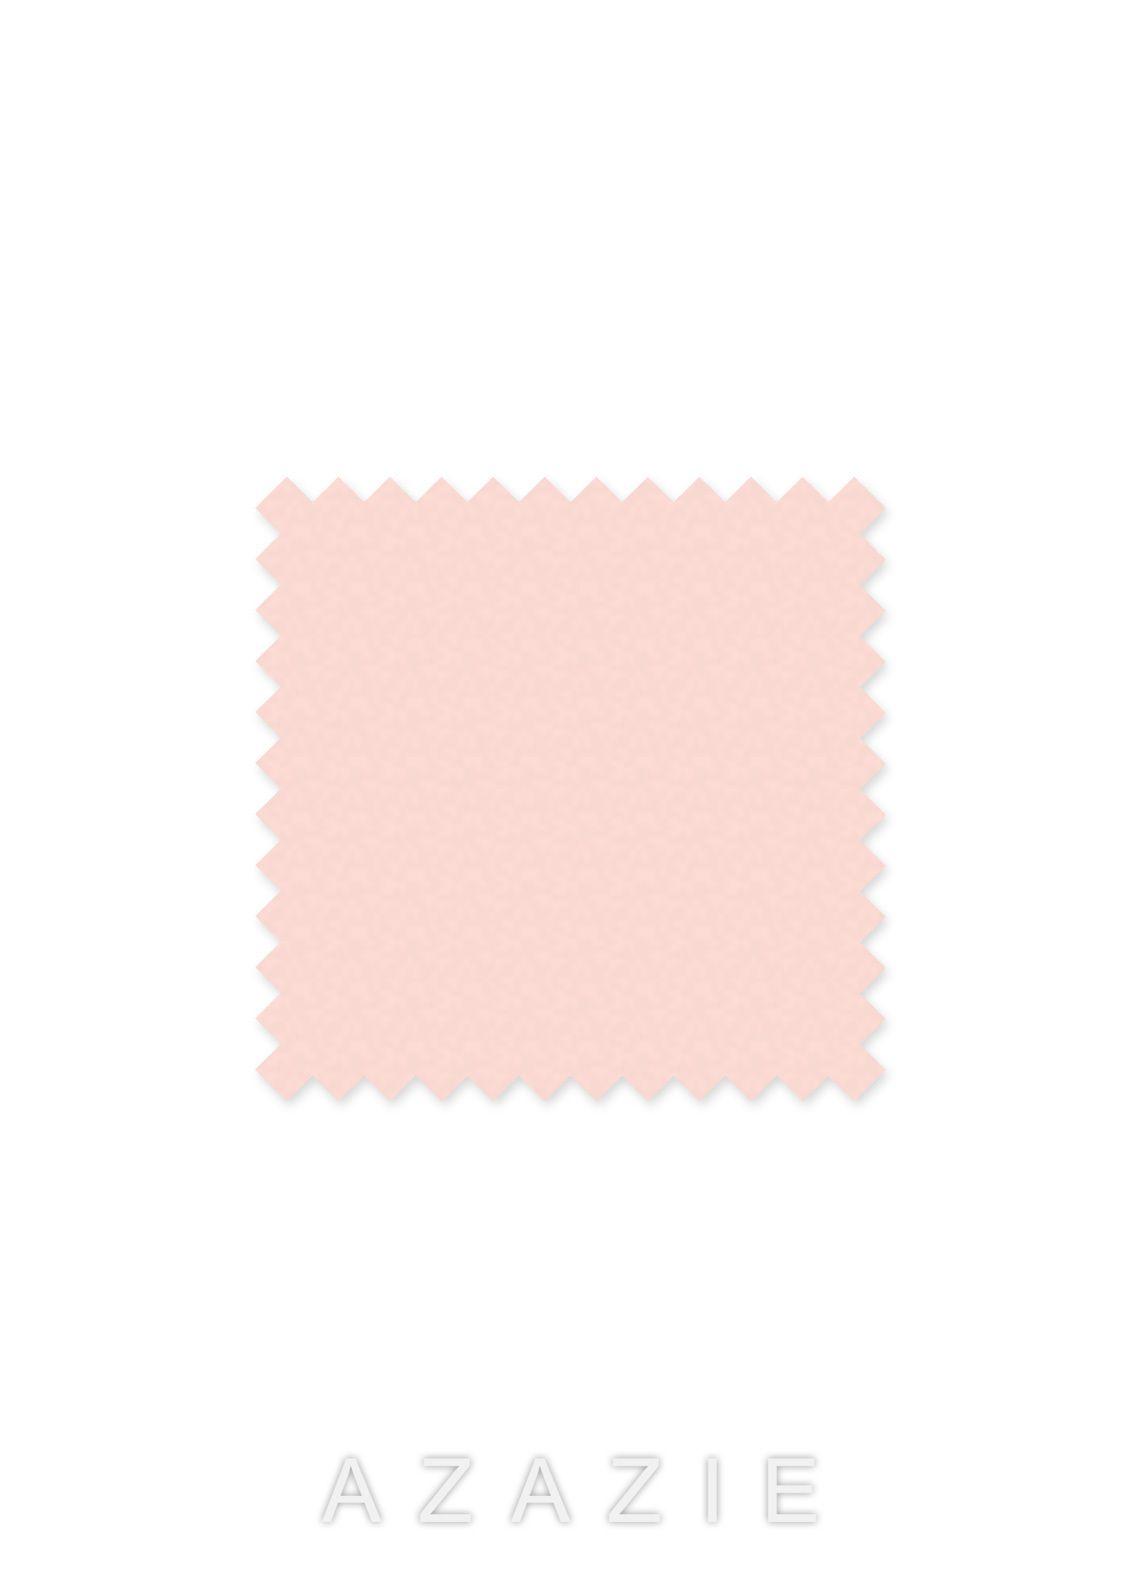 Pearl Pink Azazie Swatches - Bridesmaids & Wedding Party   Azazie